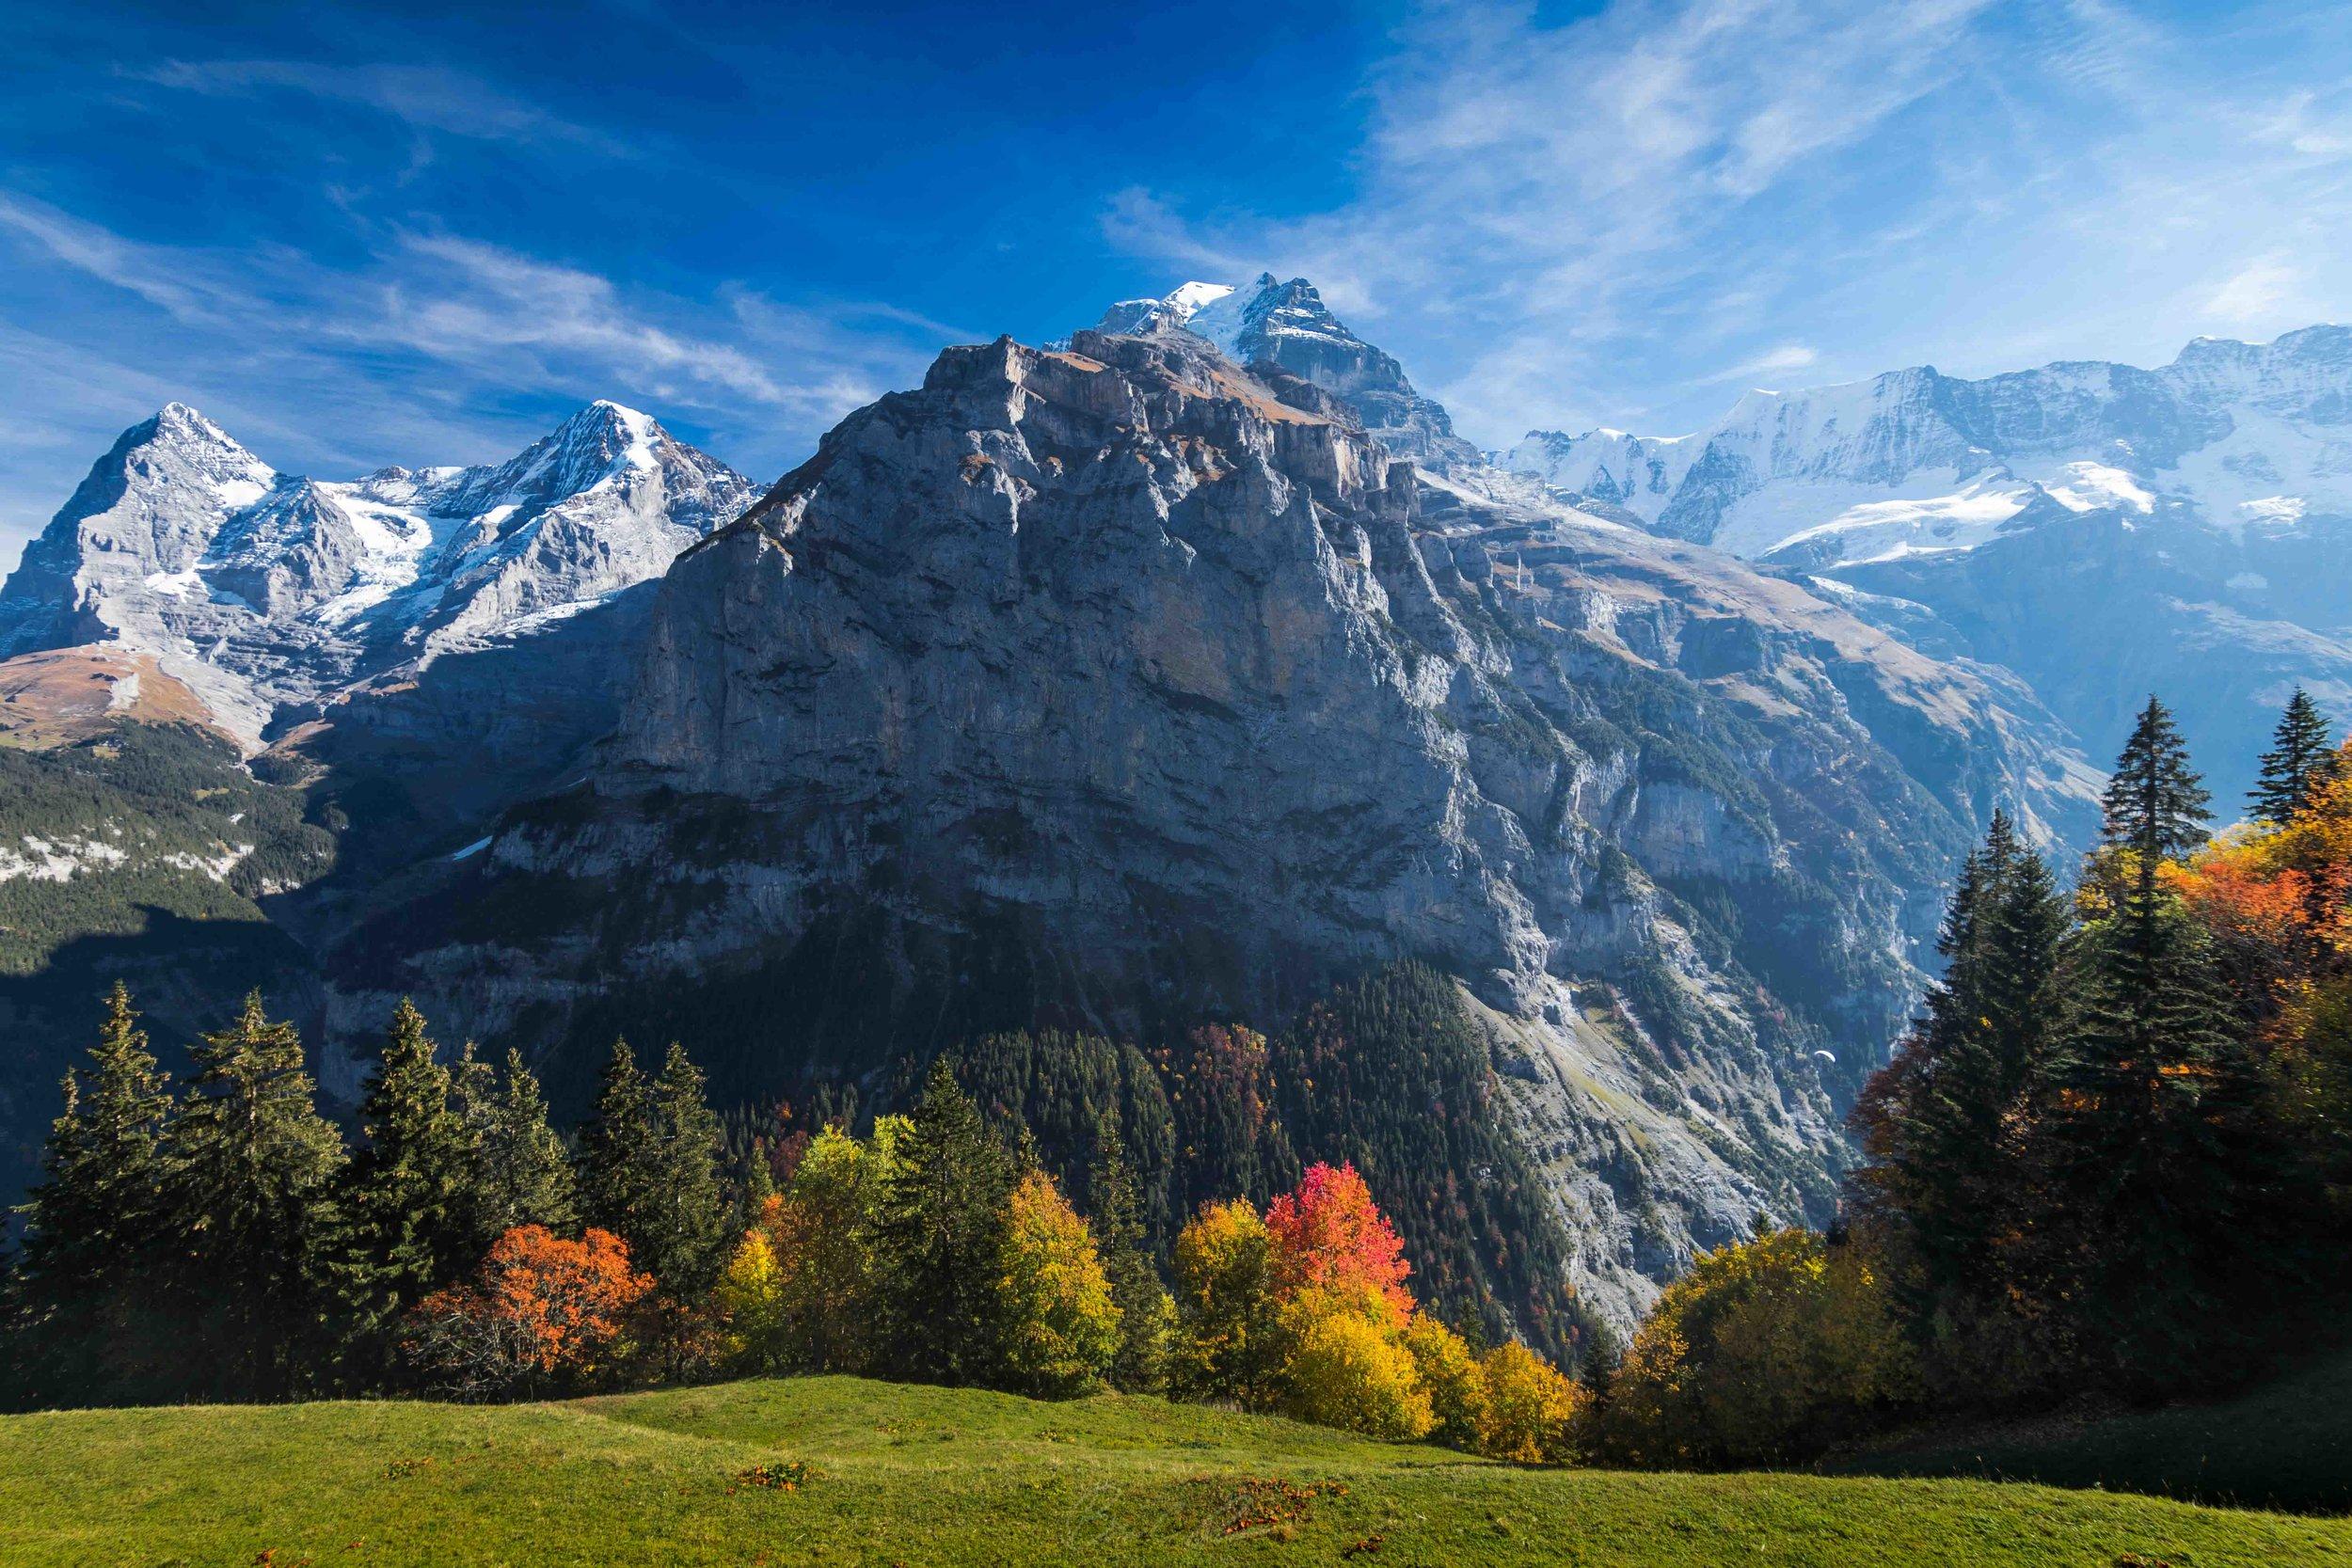 Fall in Mürren, Switzerland. View of Eiger and Lauterbrunnen Valley.